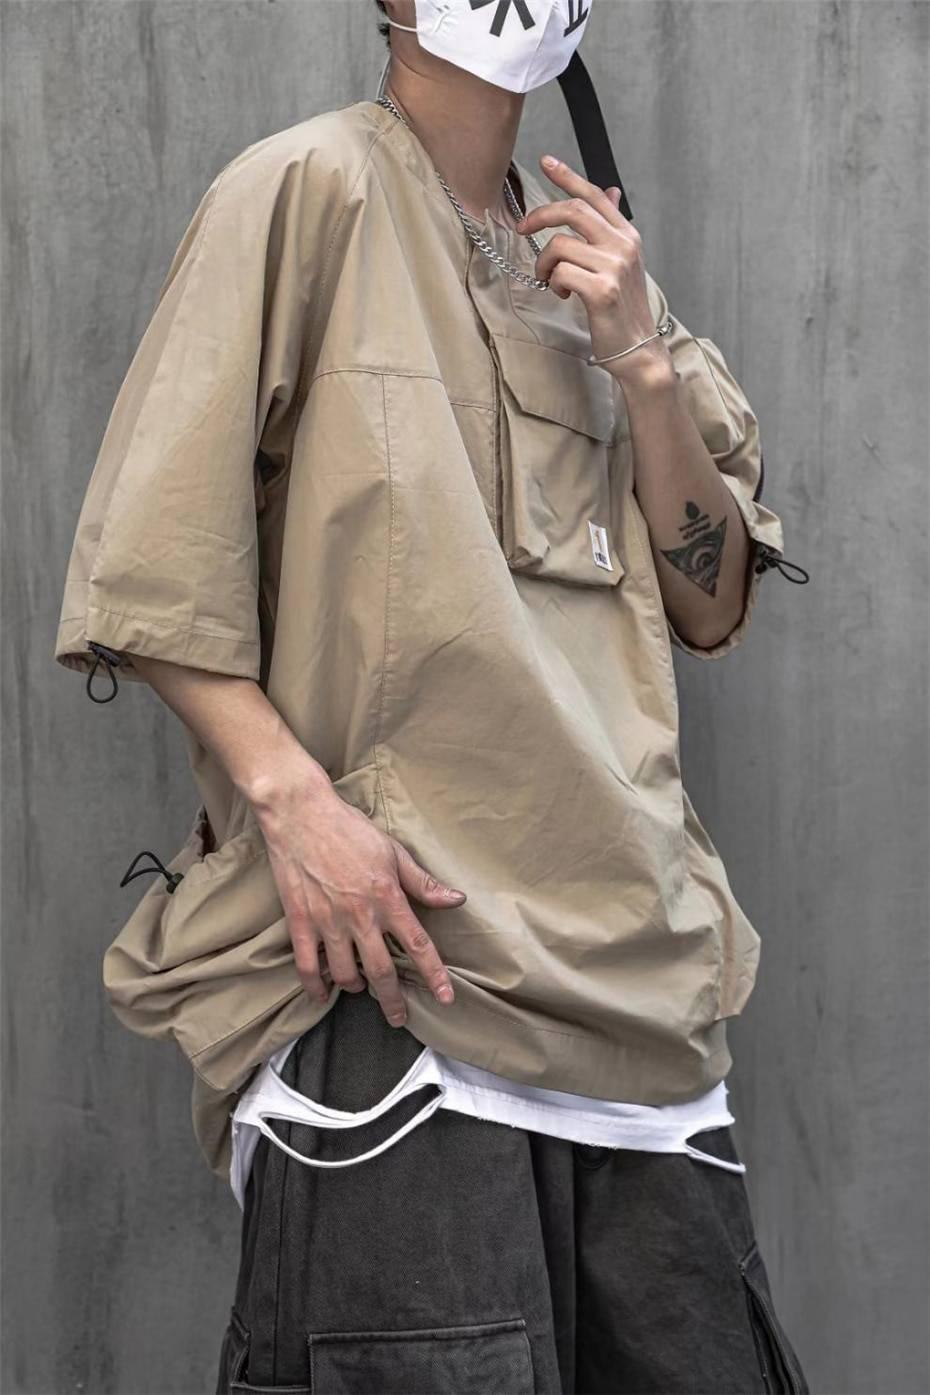 11 BYBB'S DARK 2021 Hip Hop T Shirt Men Summer Multi Pockets Oversize Tshirts Streetwear Functional Harajuku T-Shirt WB122